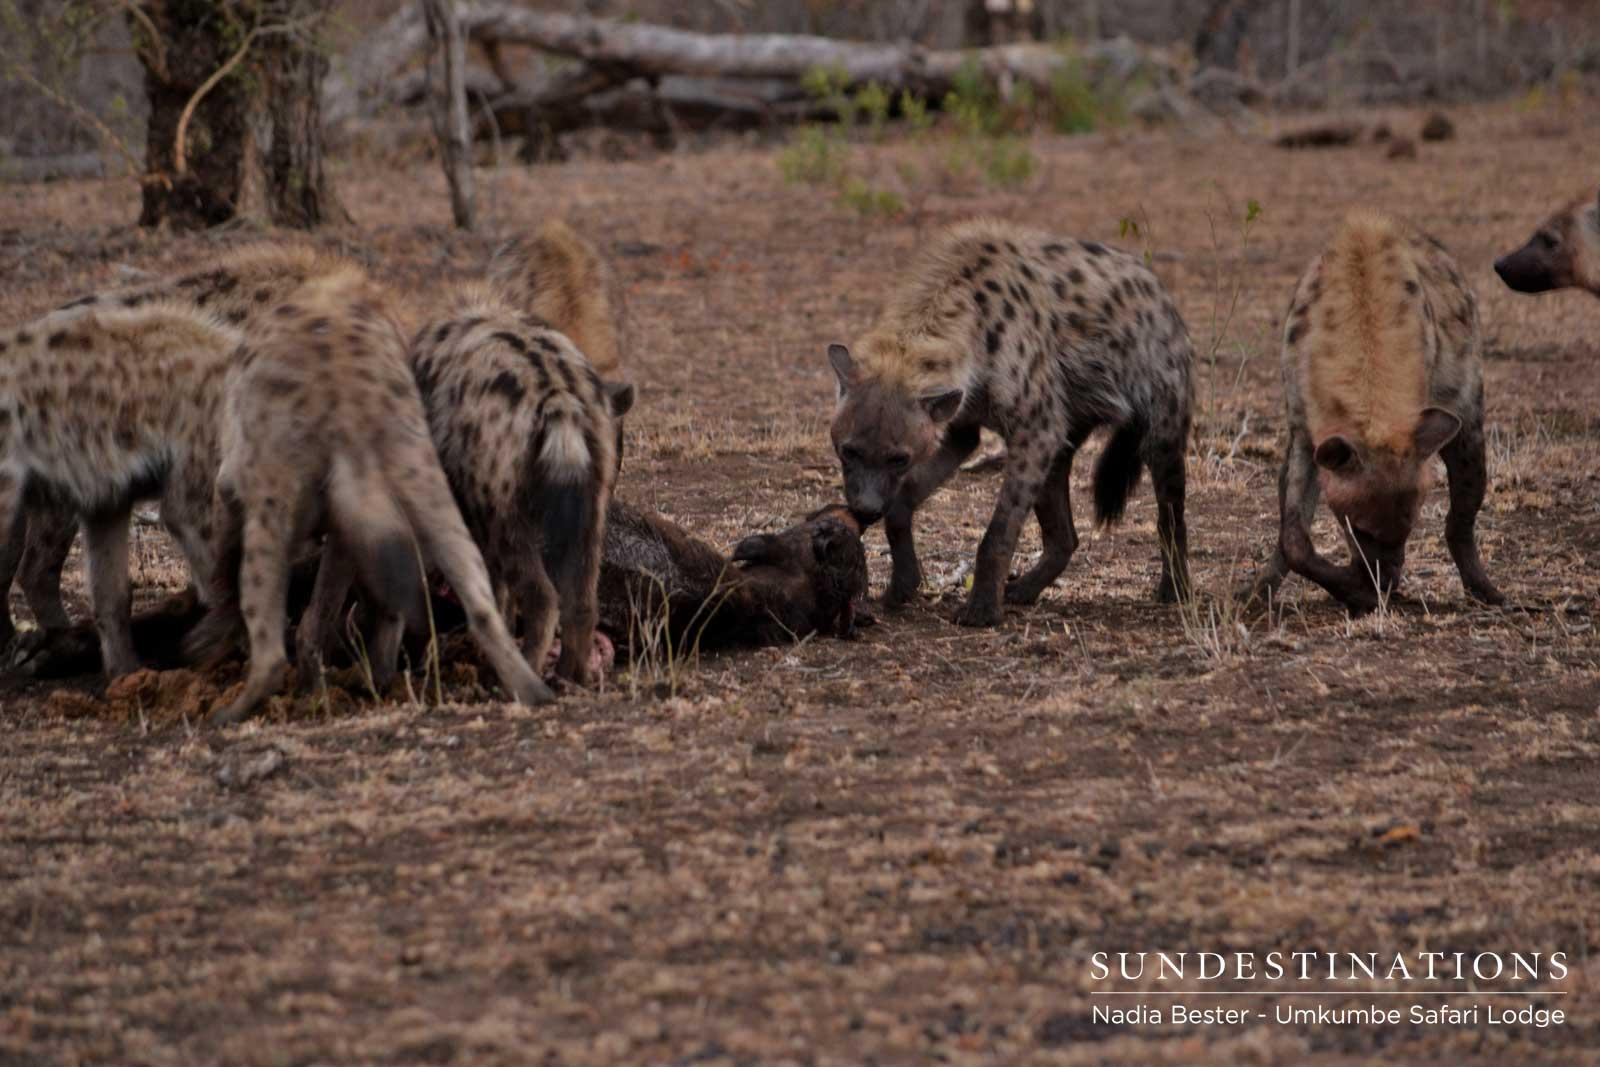 Carnivore Feast in the Sabi Sand